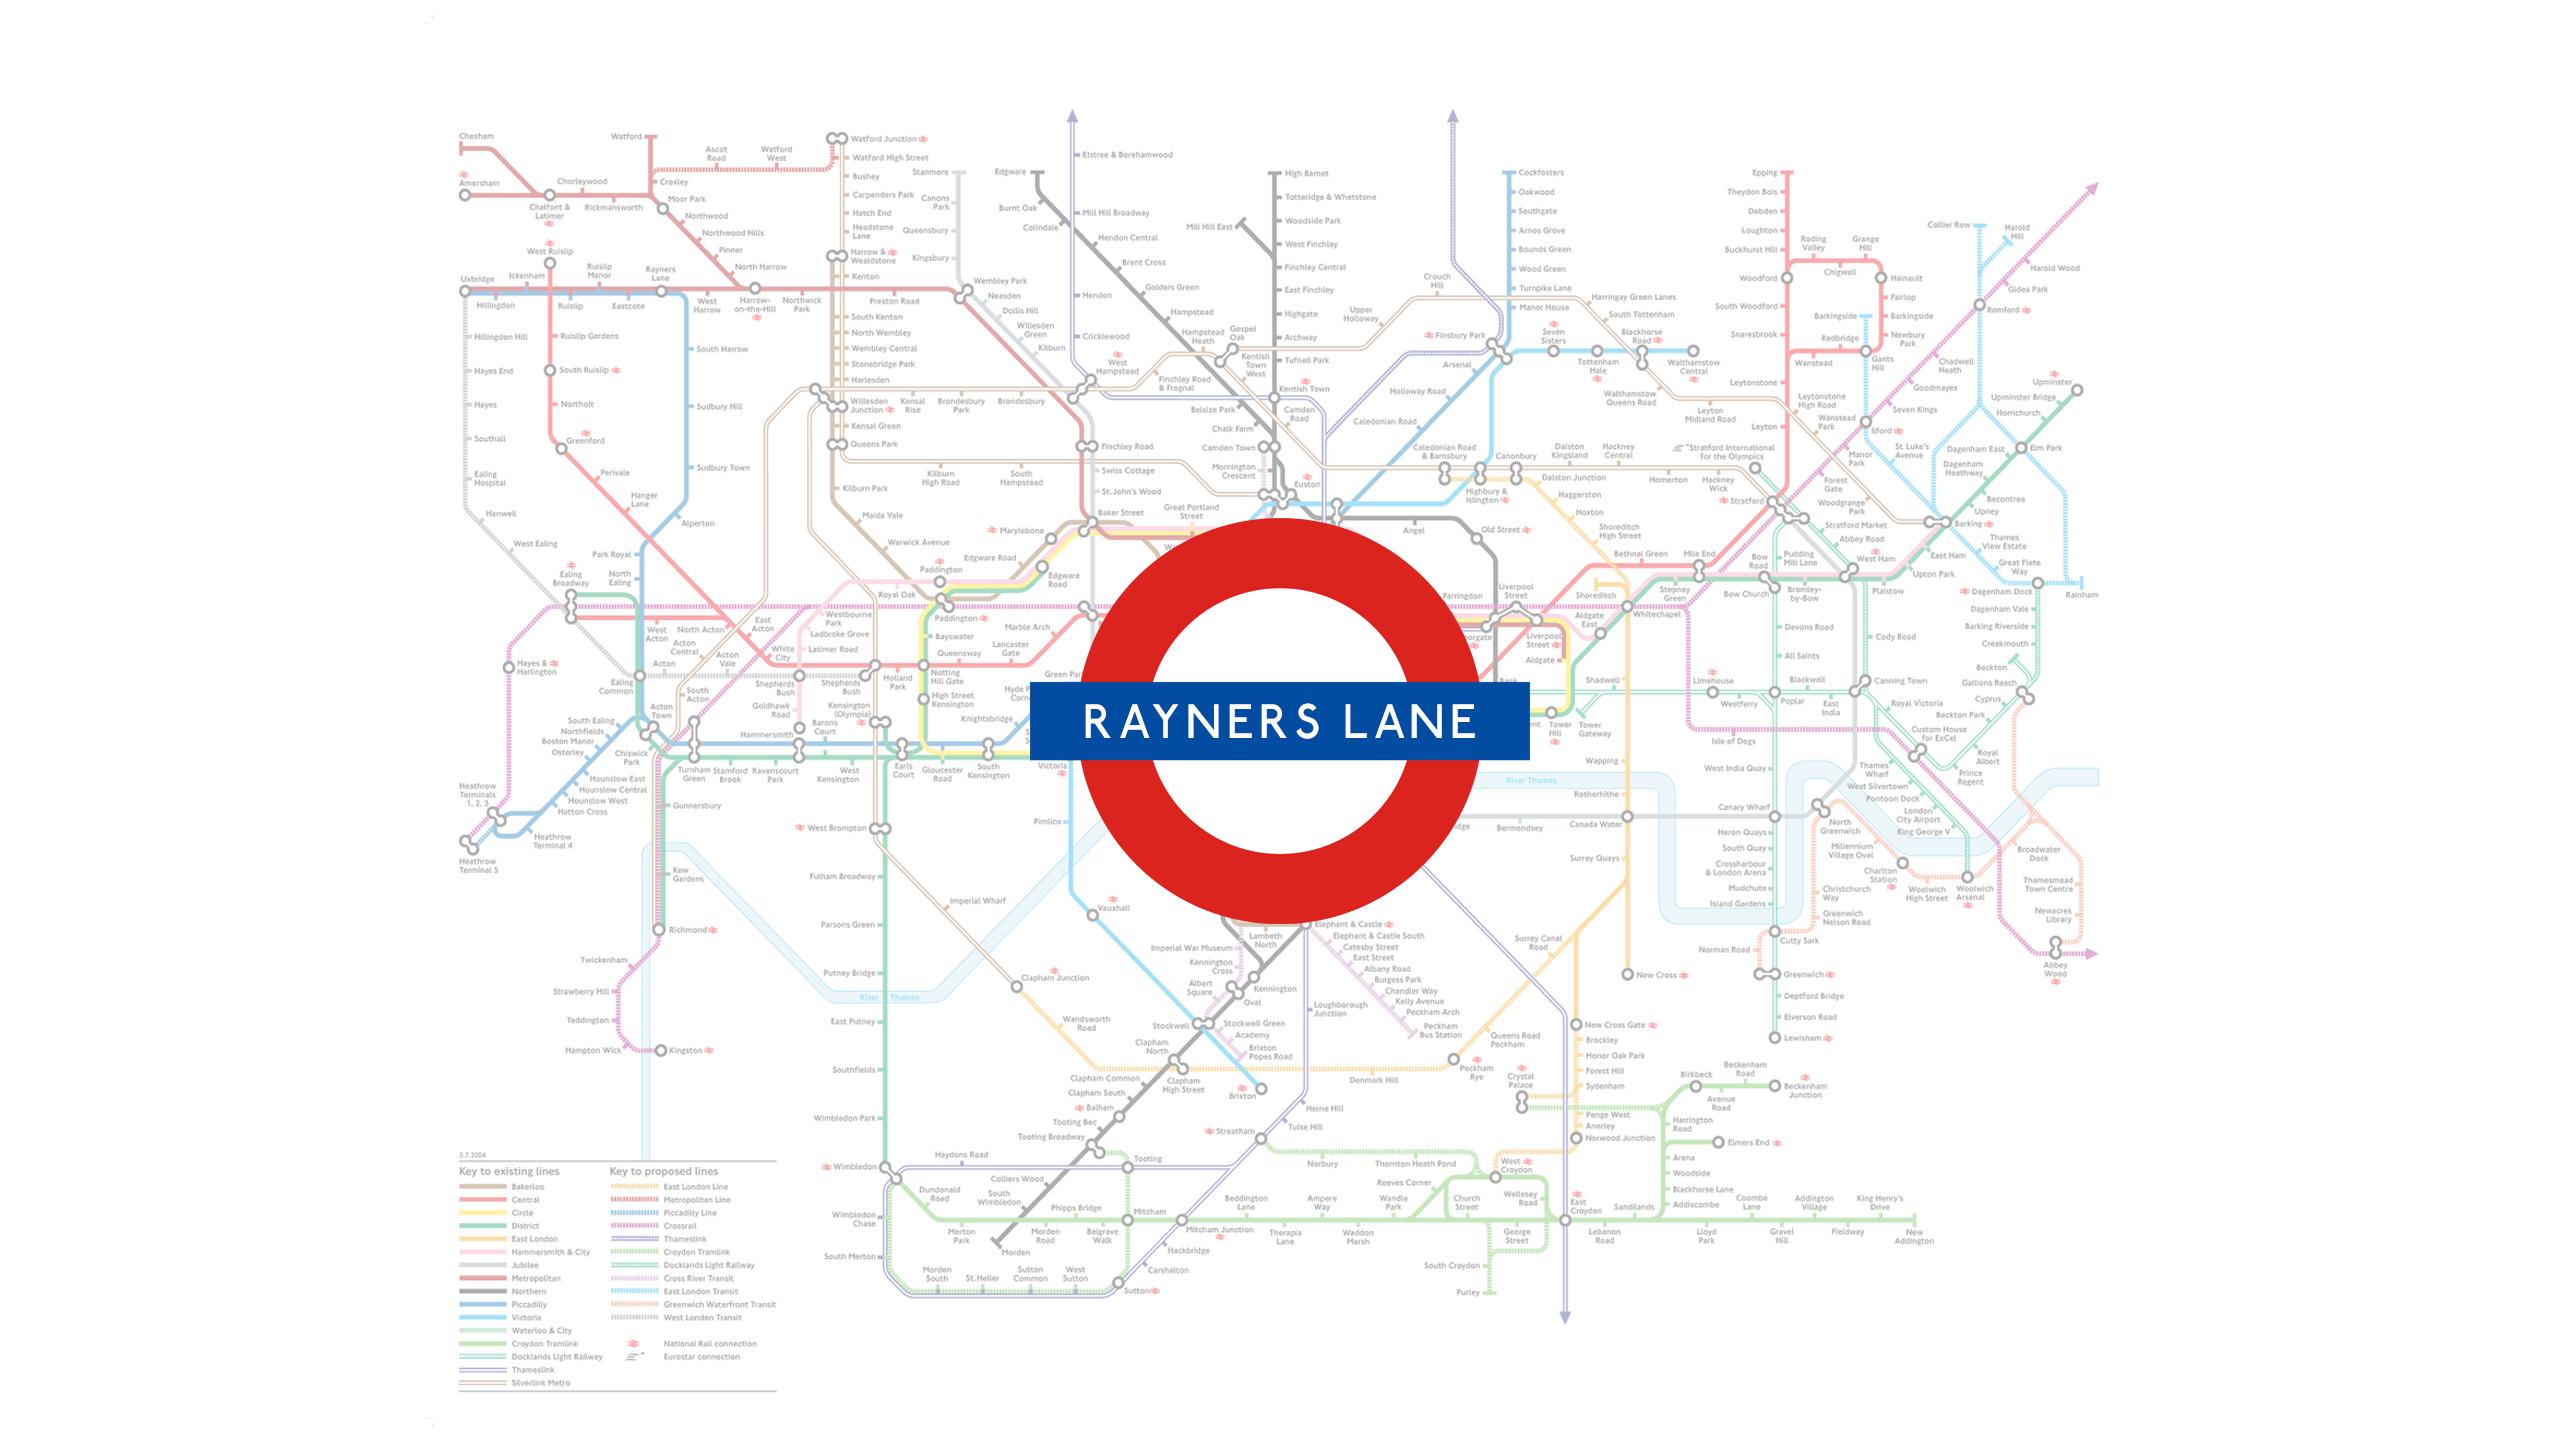 Rayners Lane (Map)